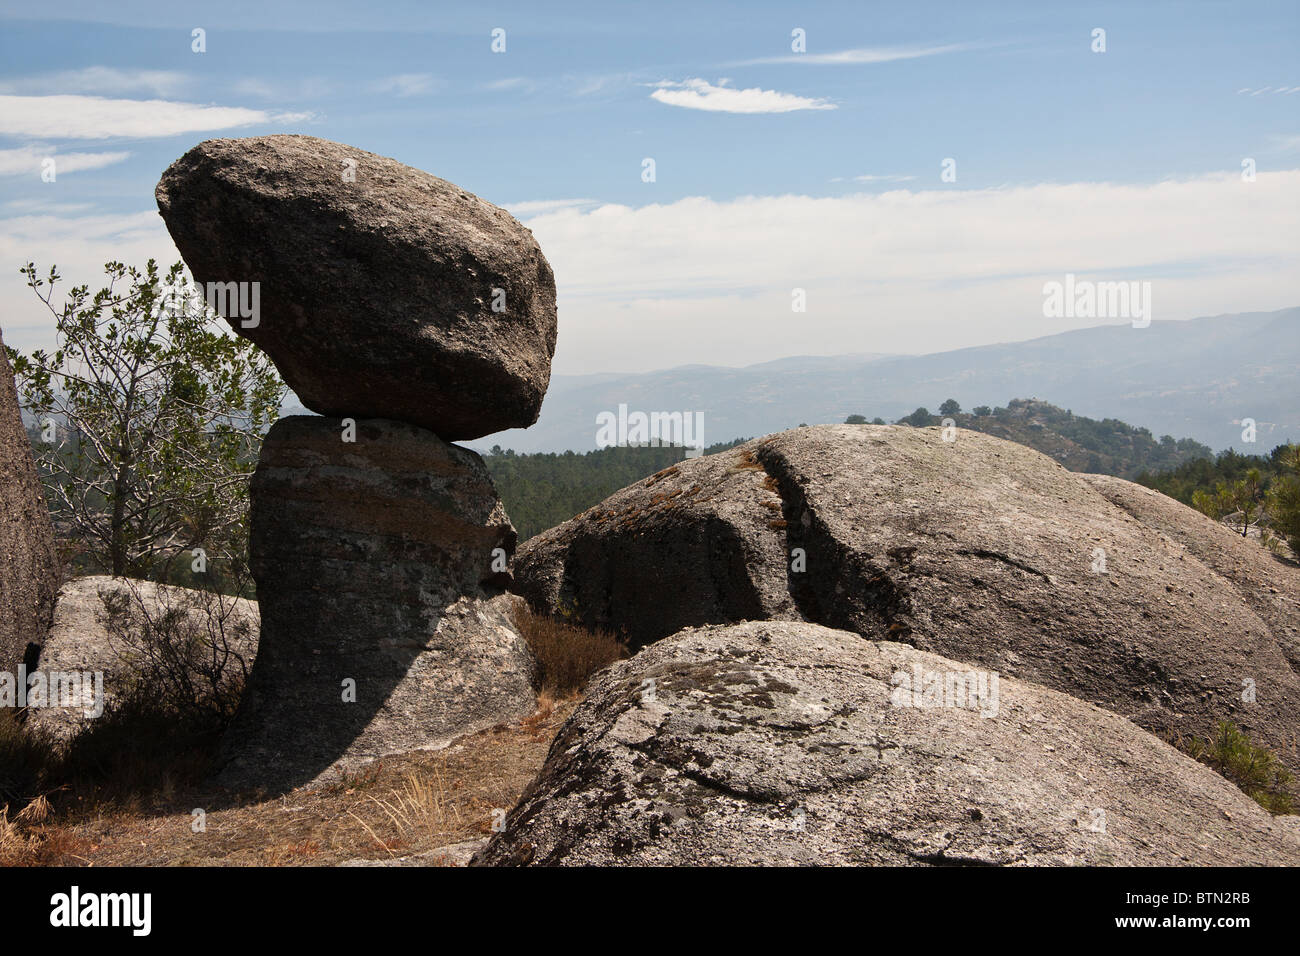 Rock lost in the middle of Serra do Gerês in Portugal that looks like an Alien. Stock Photo